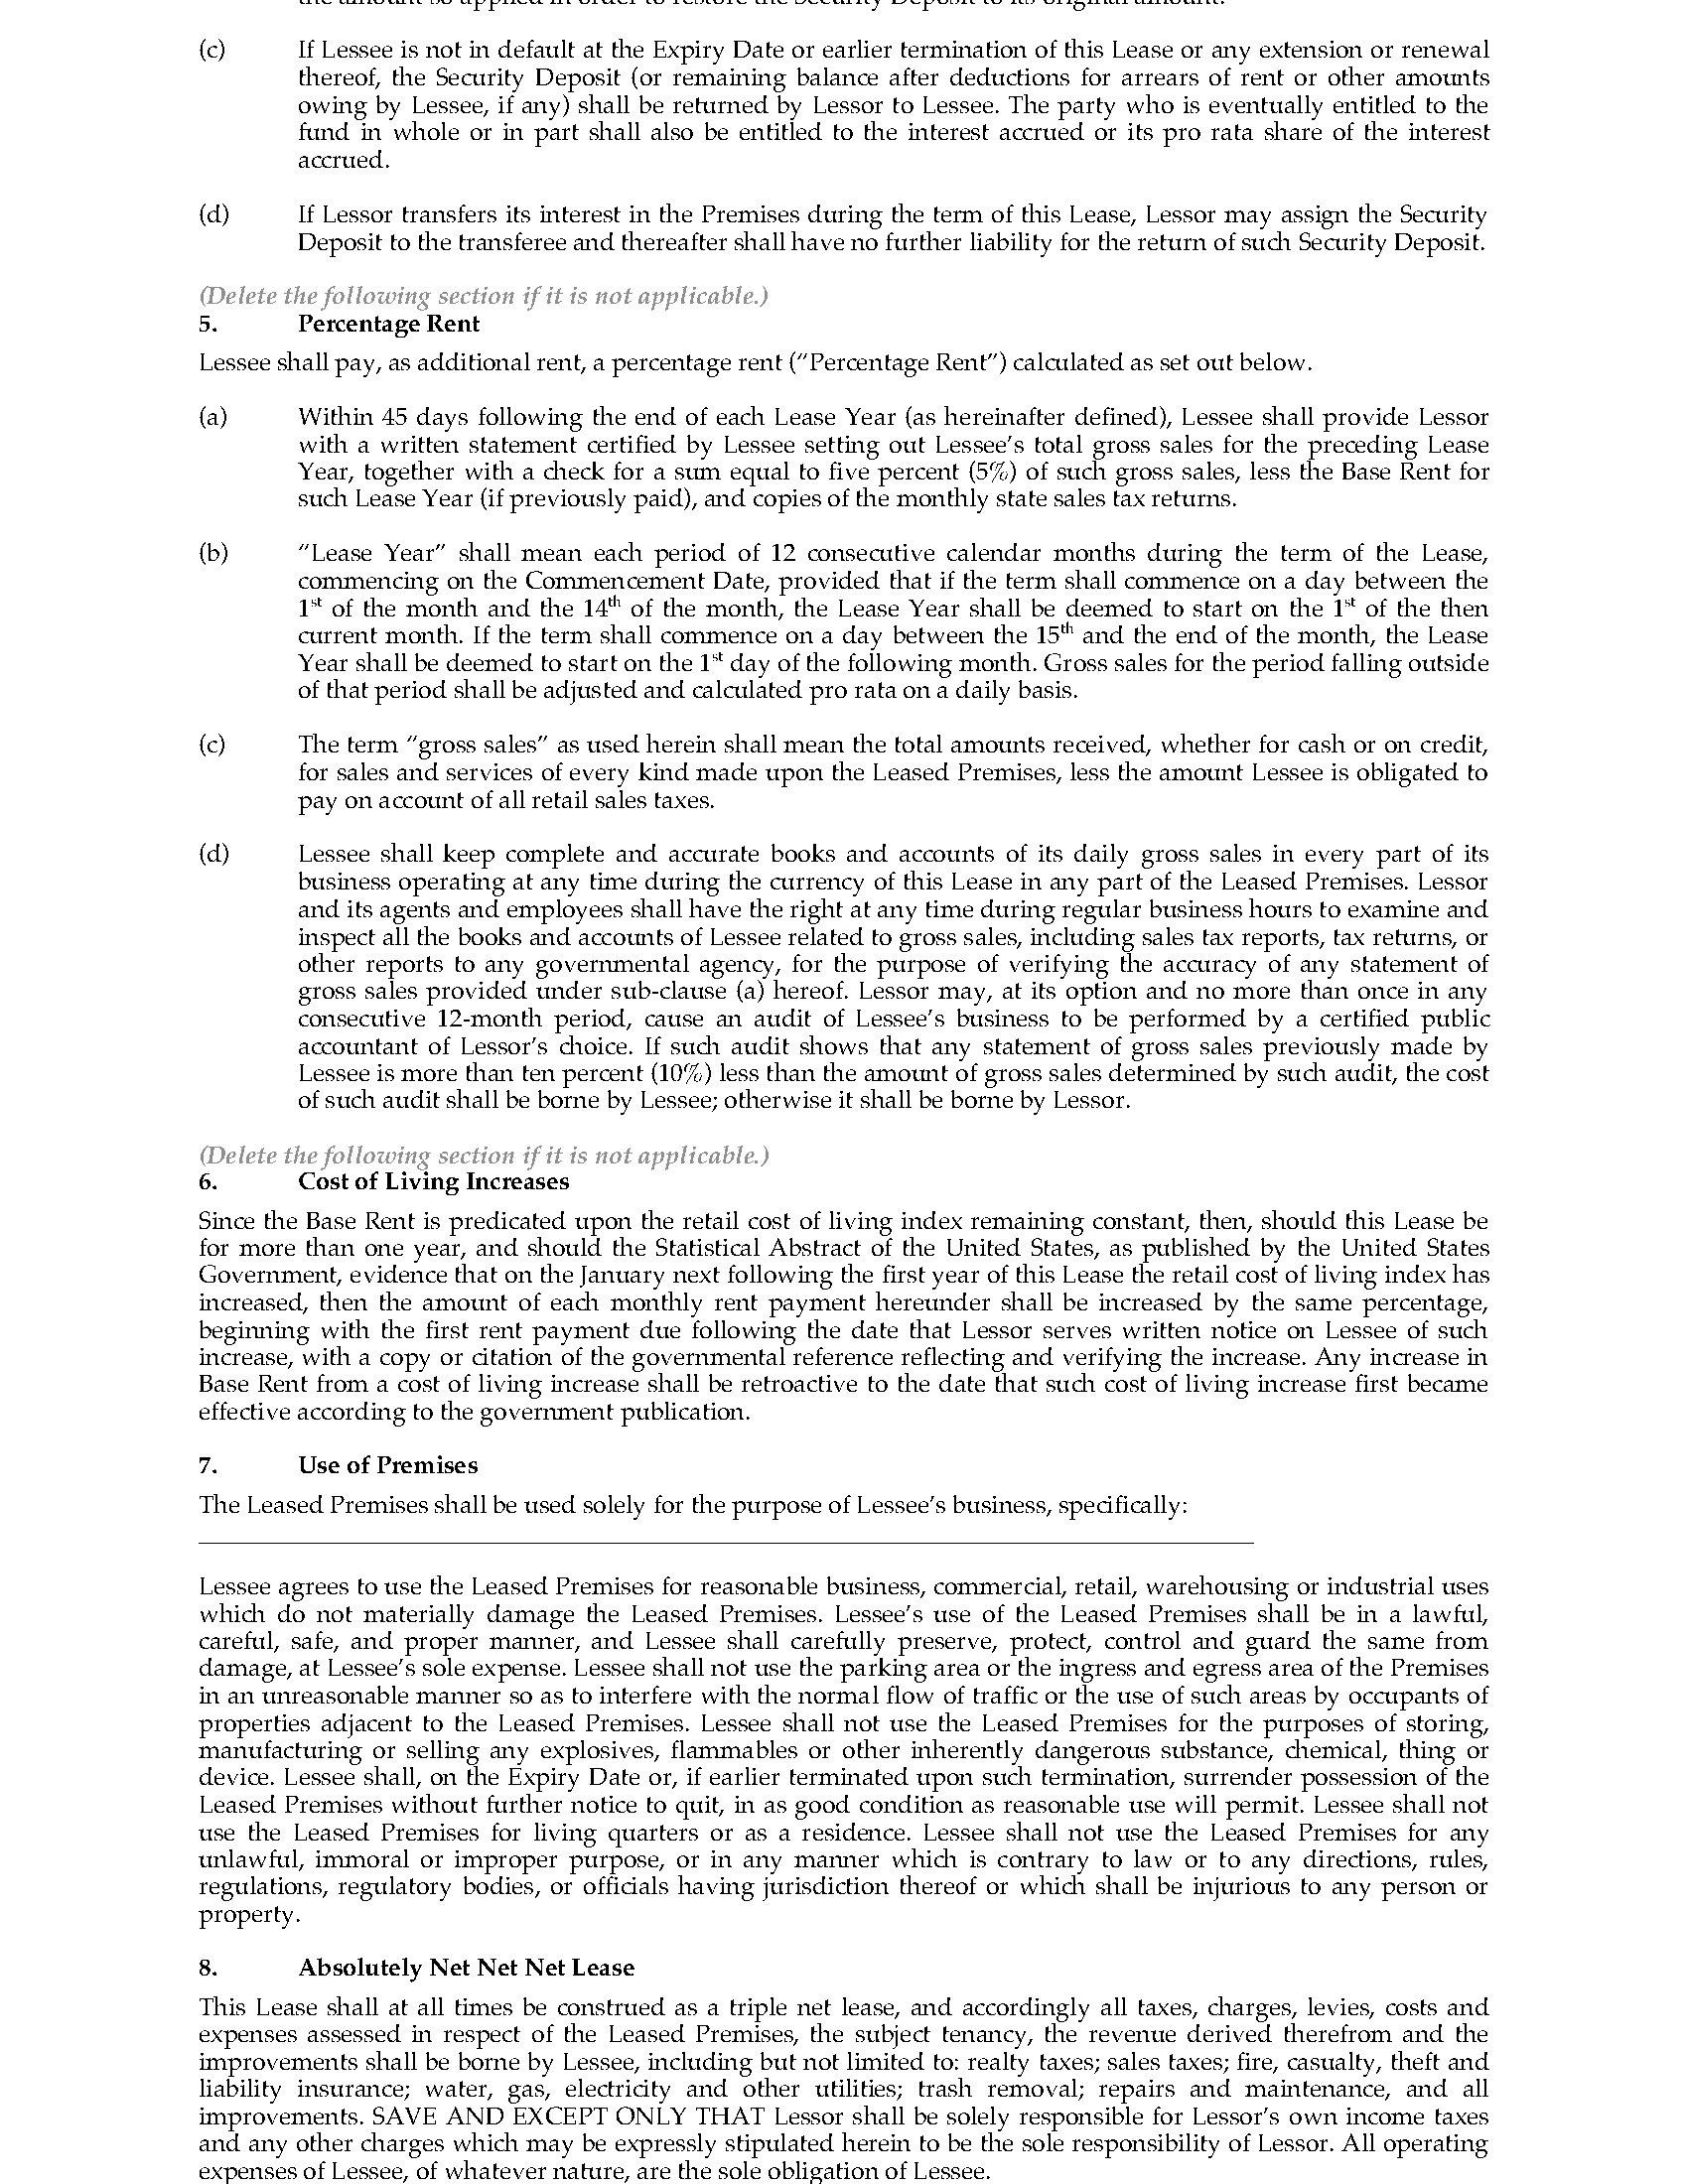 Net Lease Agreement Template Design Templates